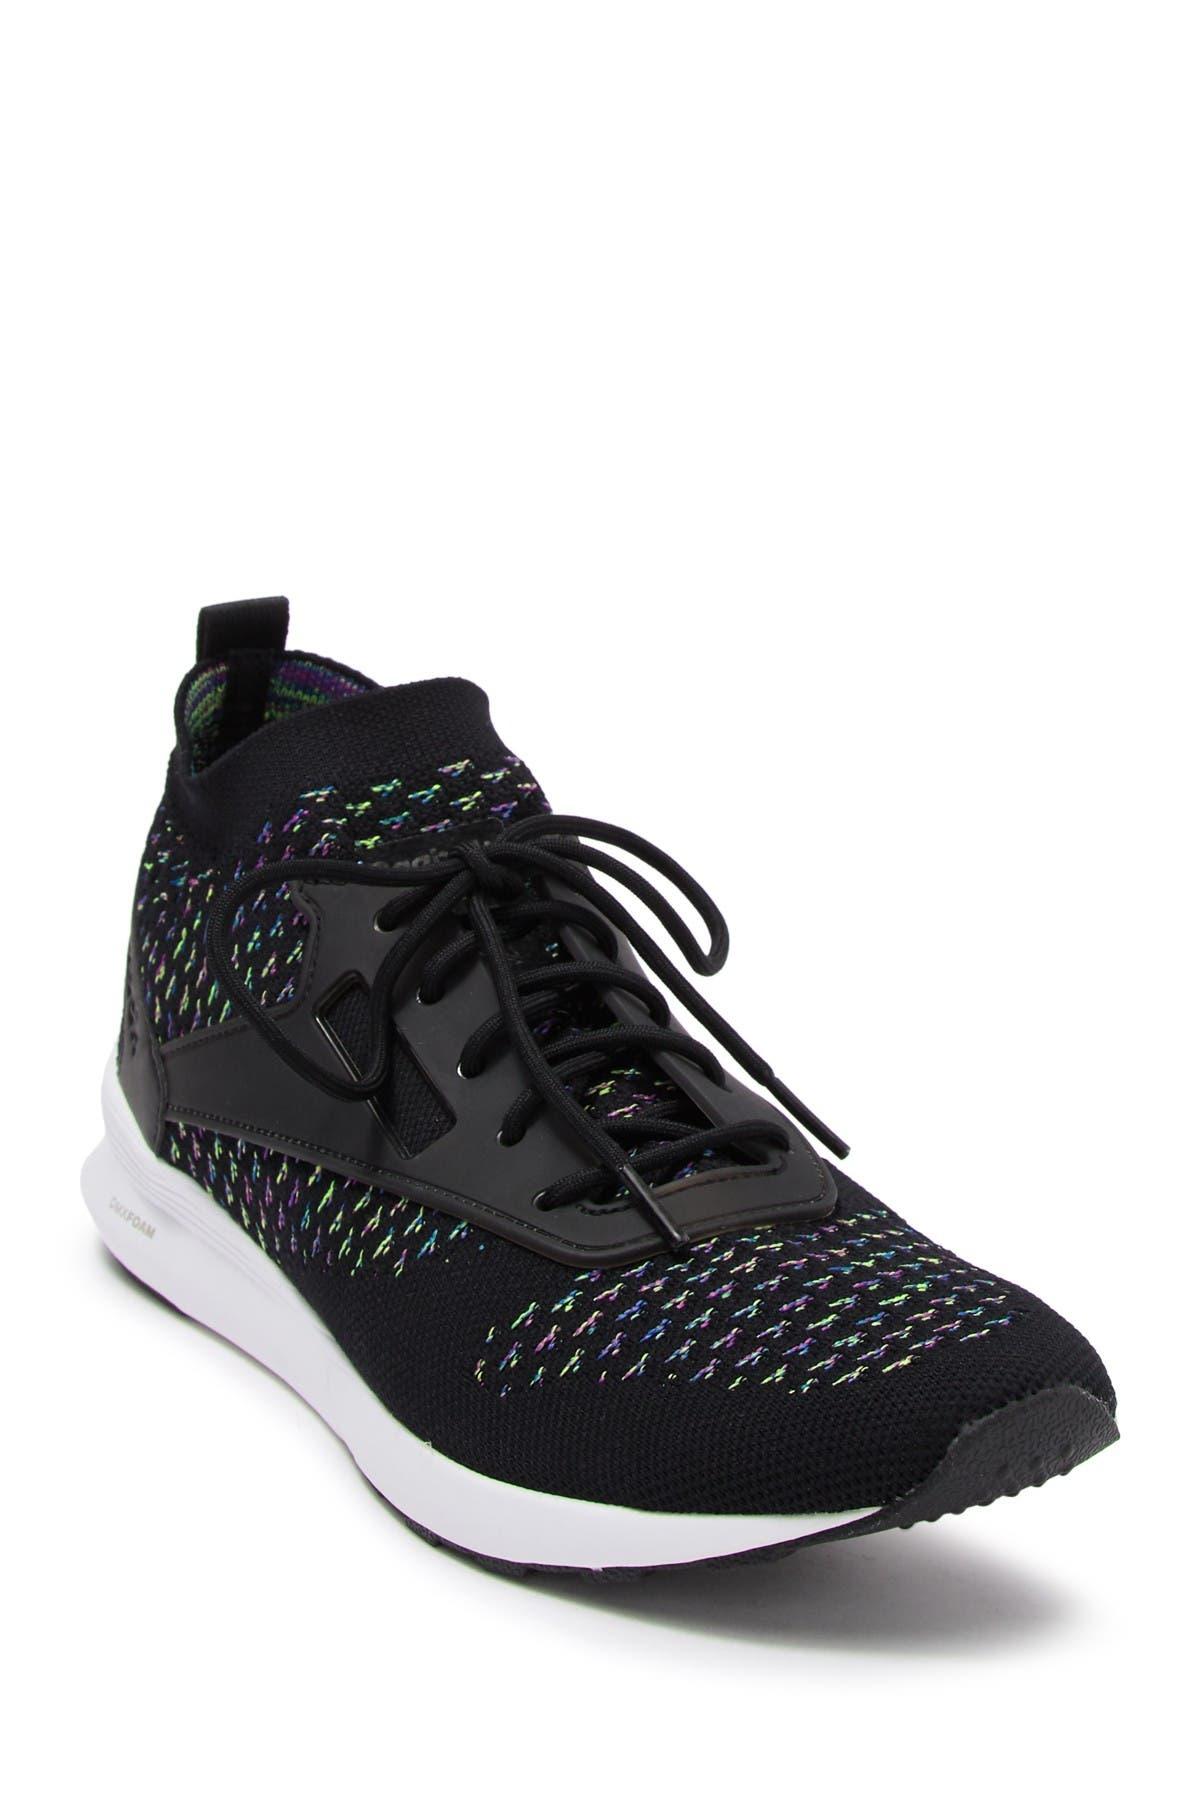 Image of Reebok Zoku Runner Ultimate Sneaker